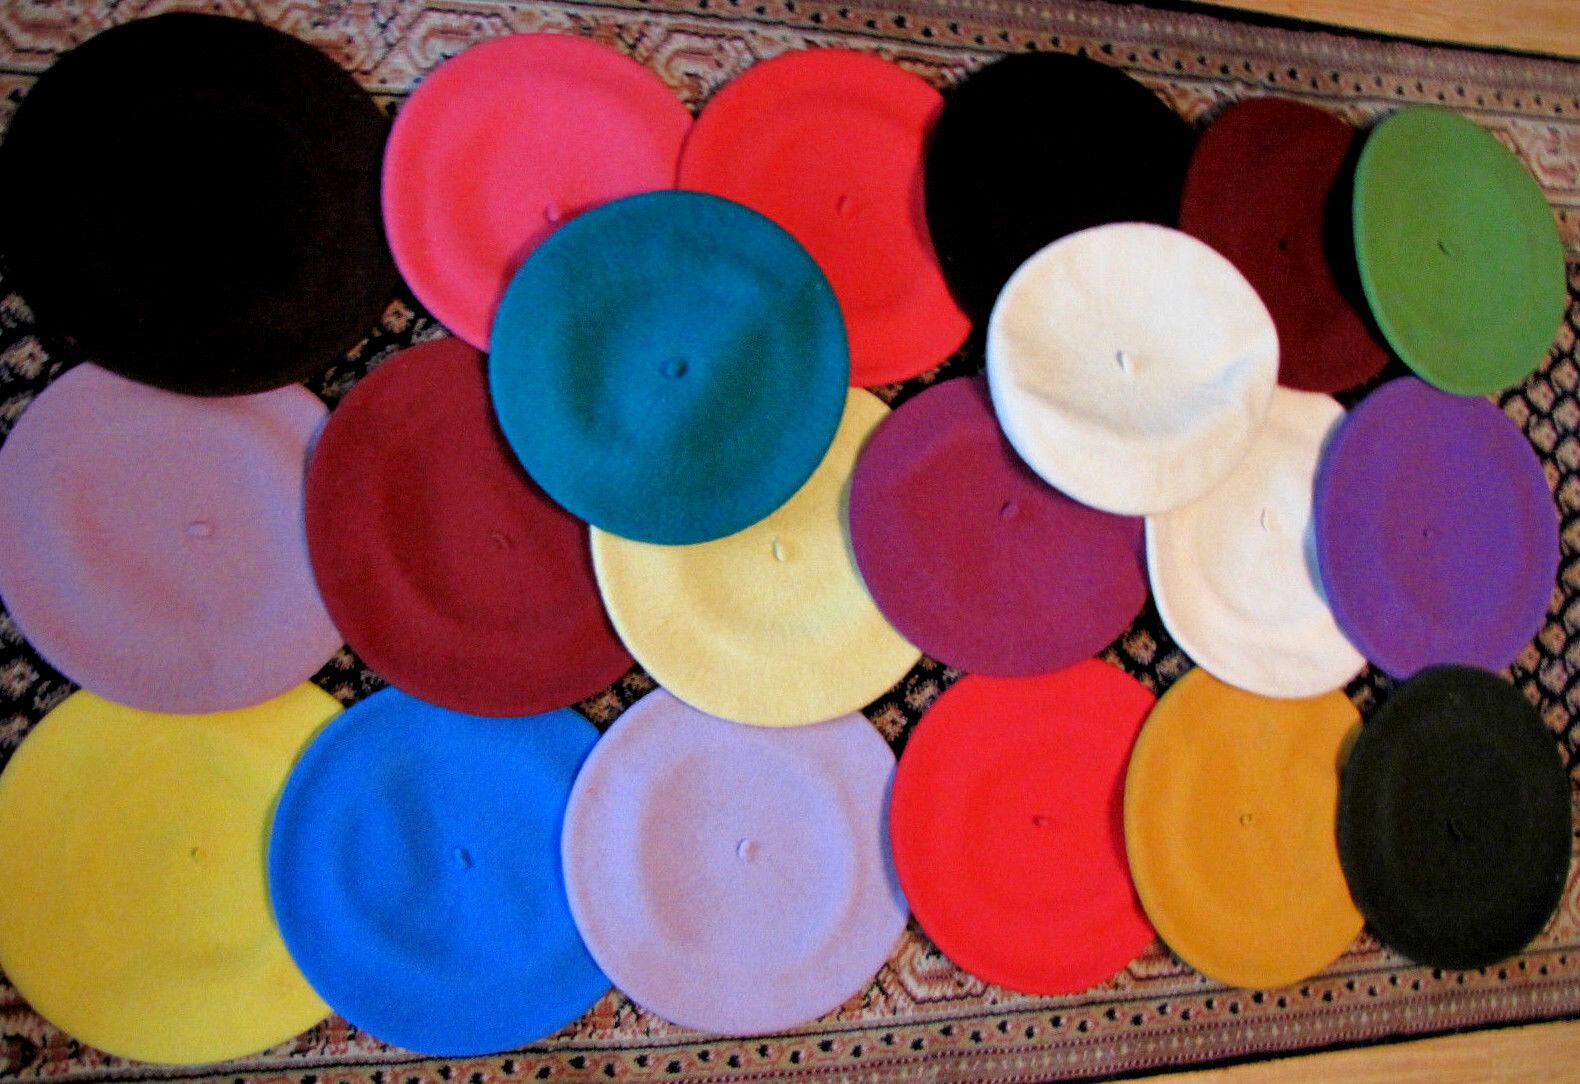 26 Baskenmützen Baskenmütze Mütze Damenbaske Damenmütze Wollmütze Tellermütze